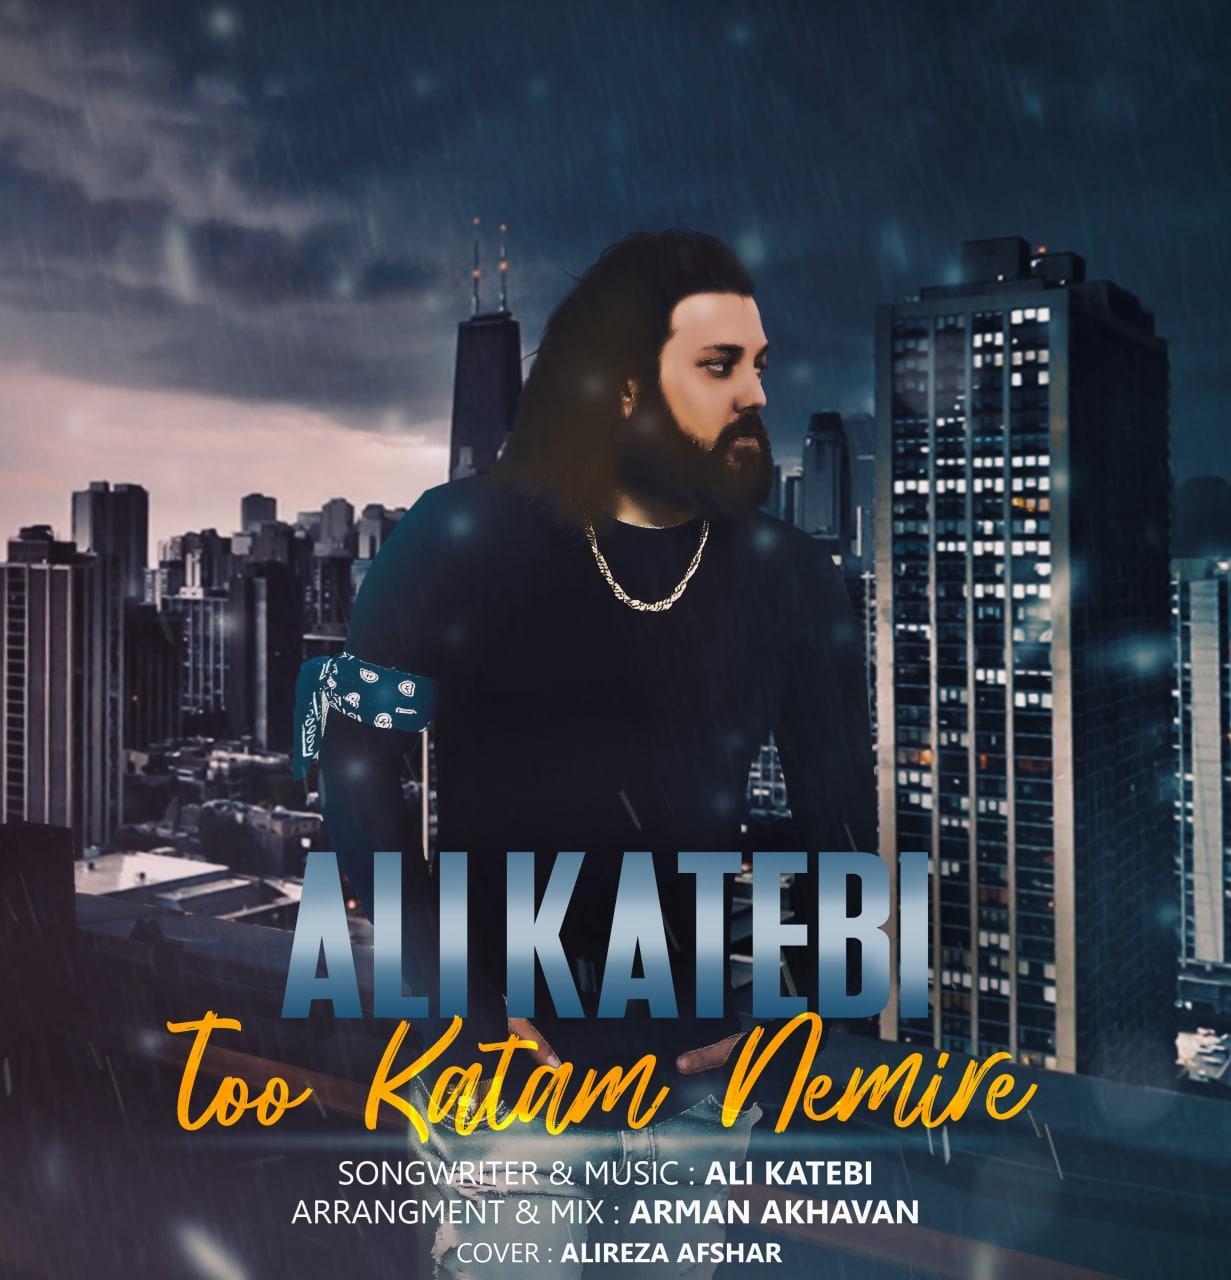 Ali Katebi – Too Katam Nemire